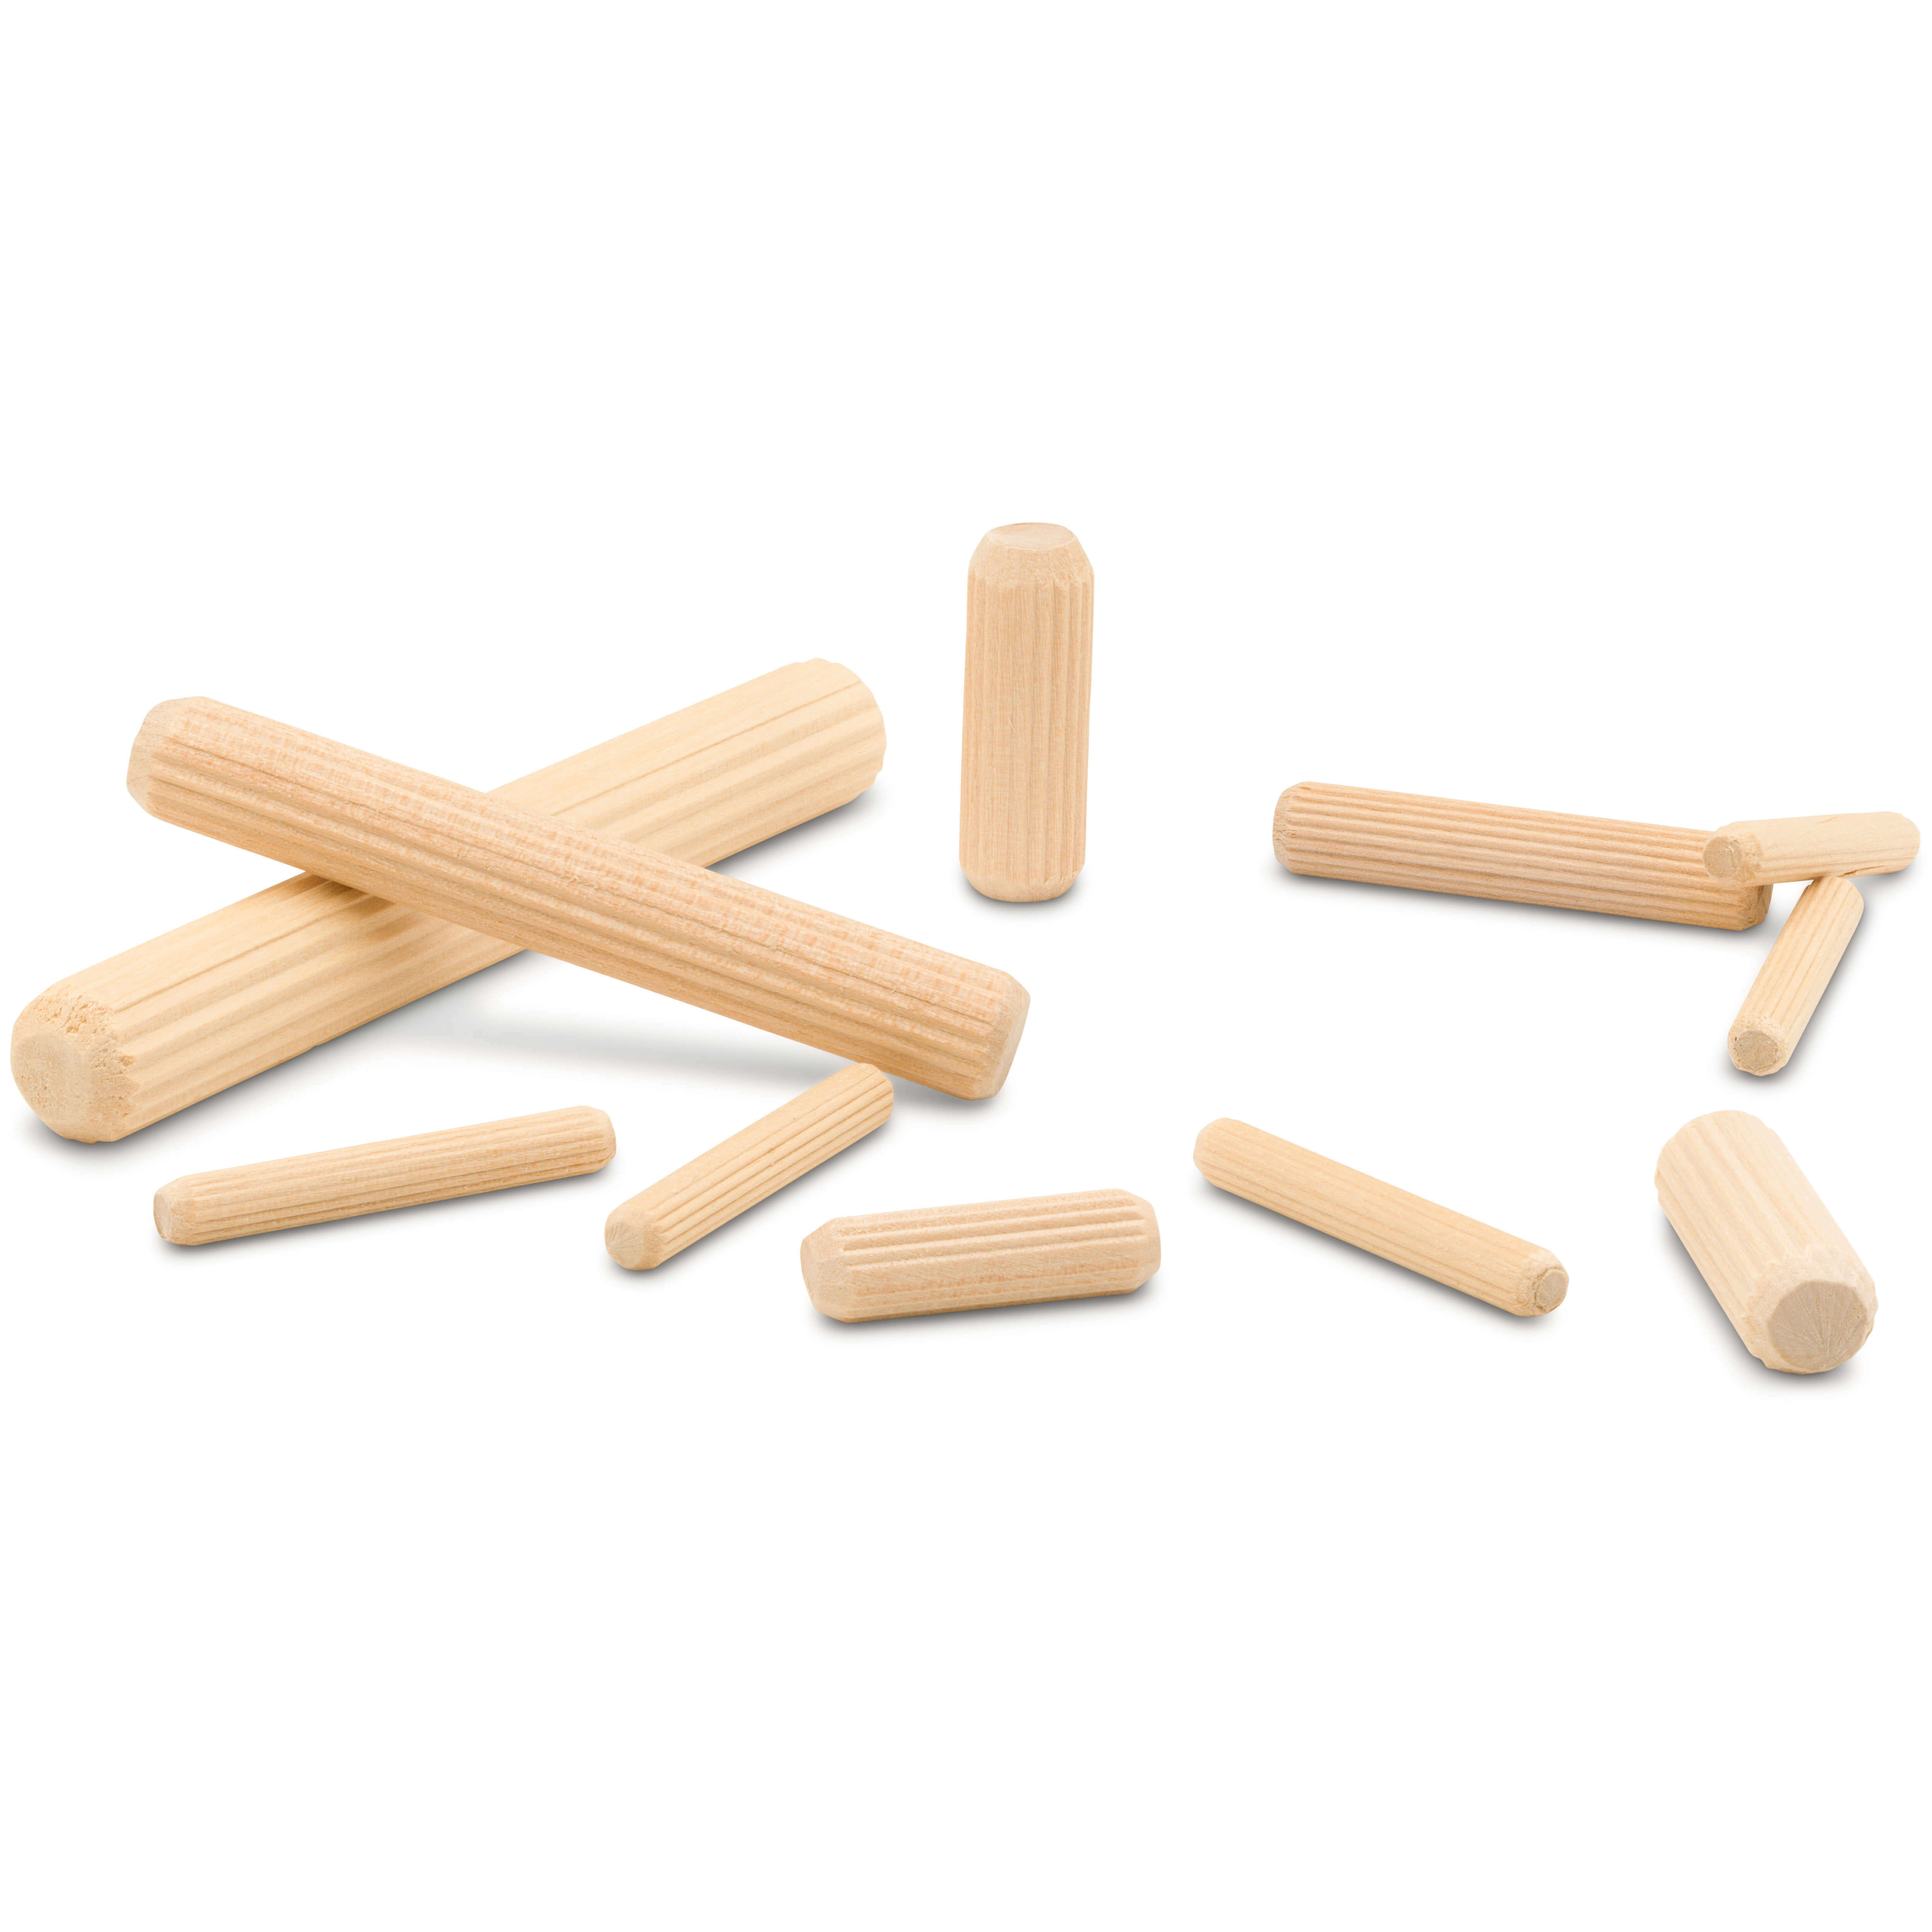 Fluted Wood Dowel Pins